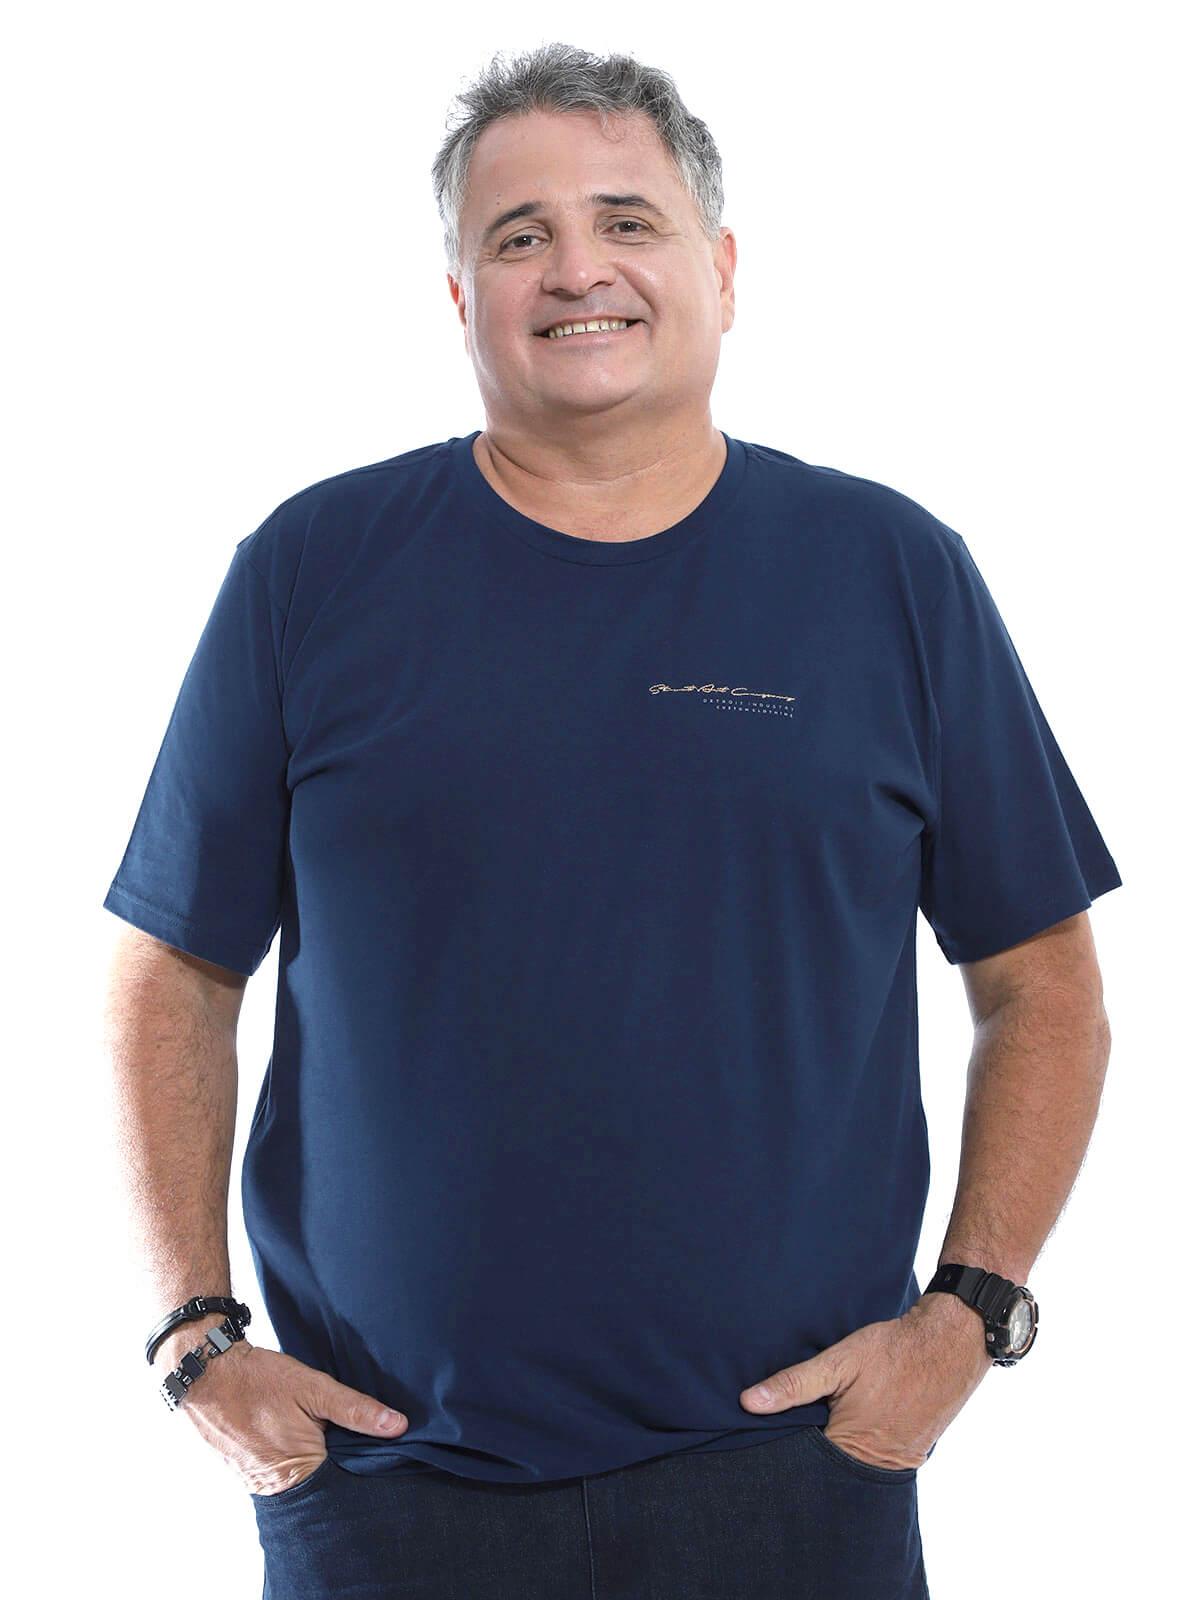 Camiseta Plus Size Anistia Street Marinho